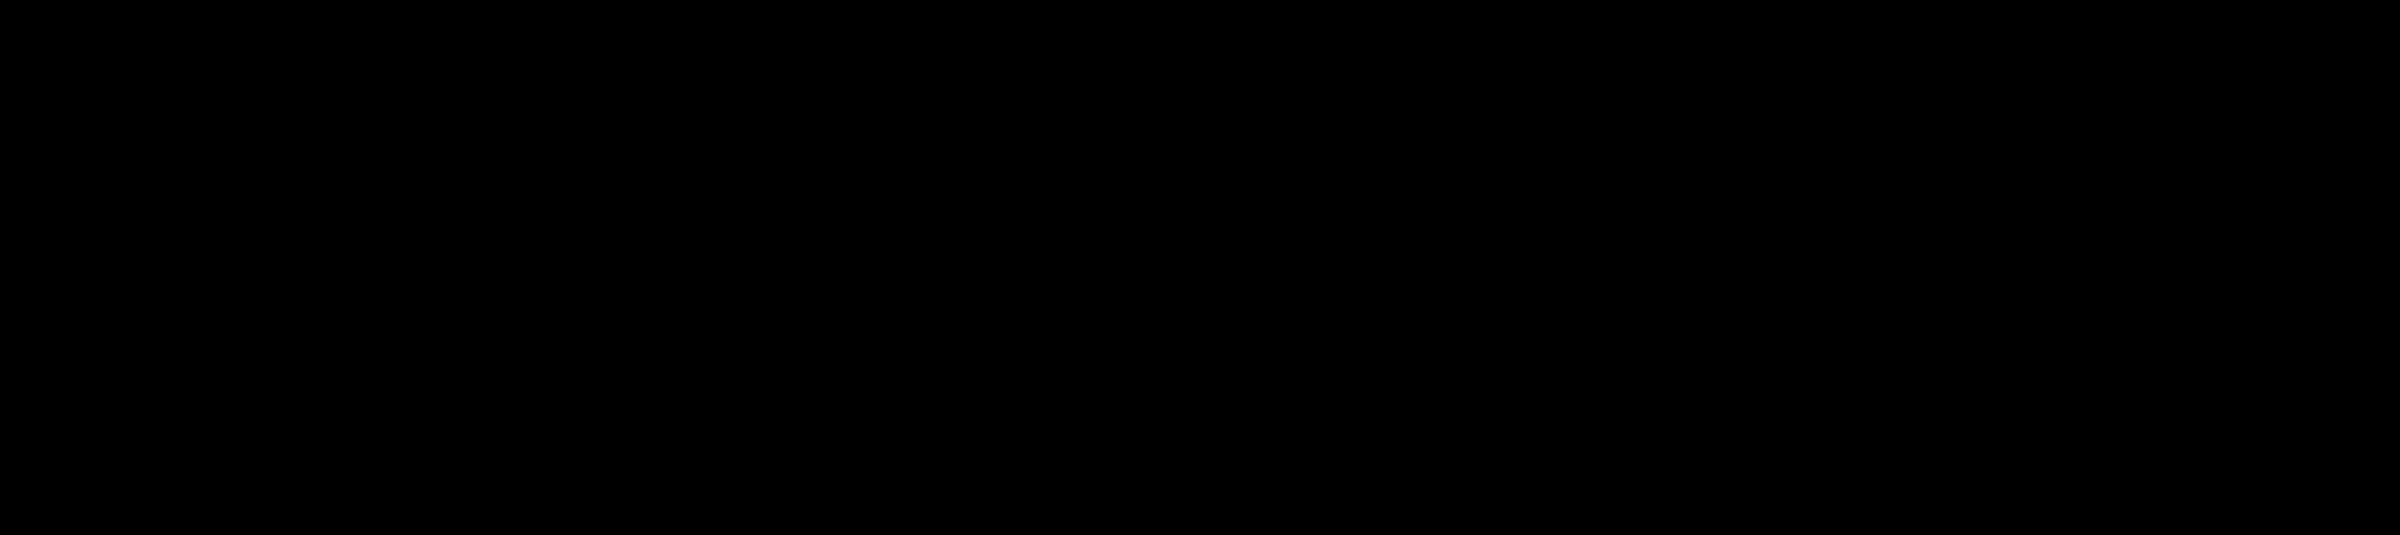 Toshiba Logo PNG Transparent & SVG Vector - Freebie Supply